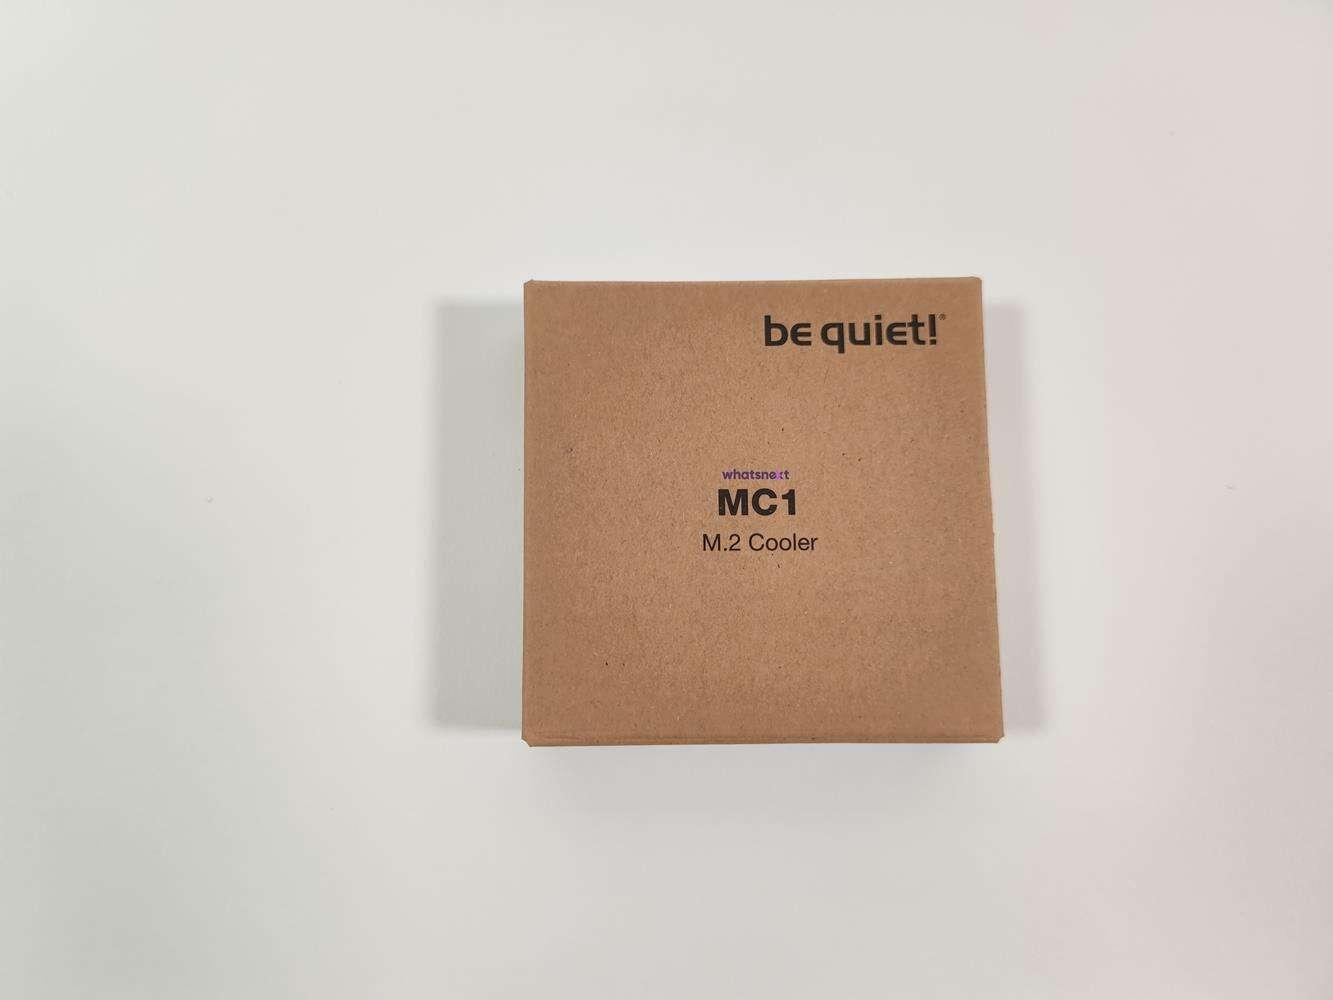 test be quiet! MC1, recenzja be quiet! MC1, opinia be quiet! MC1